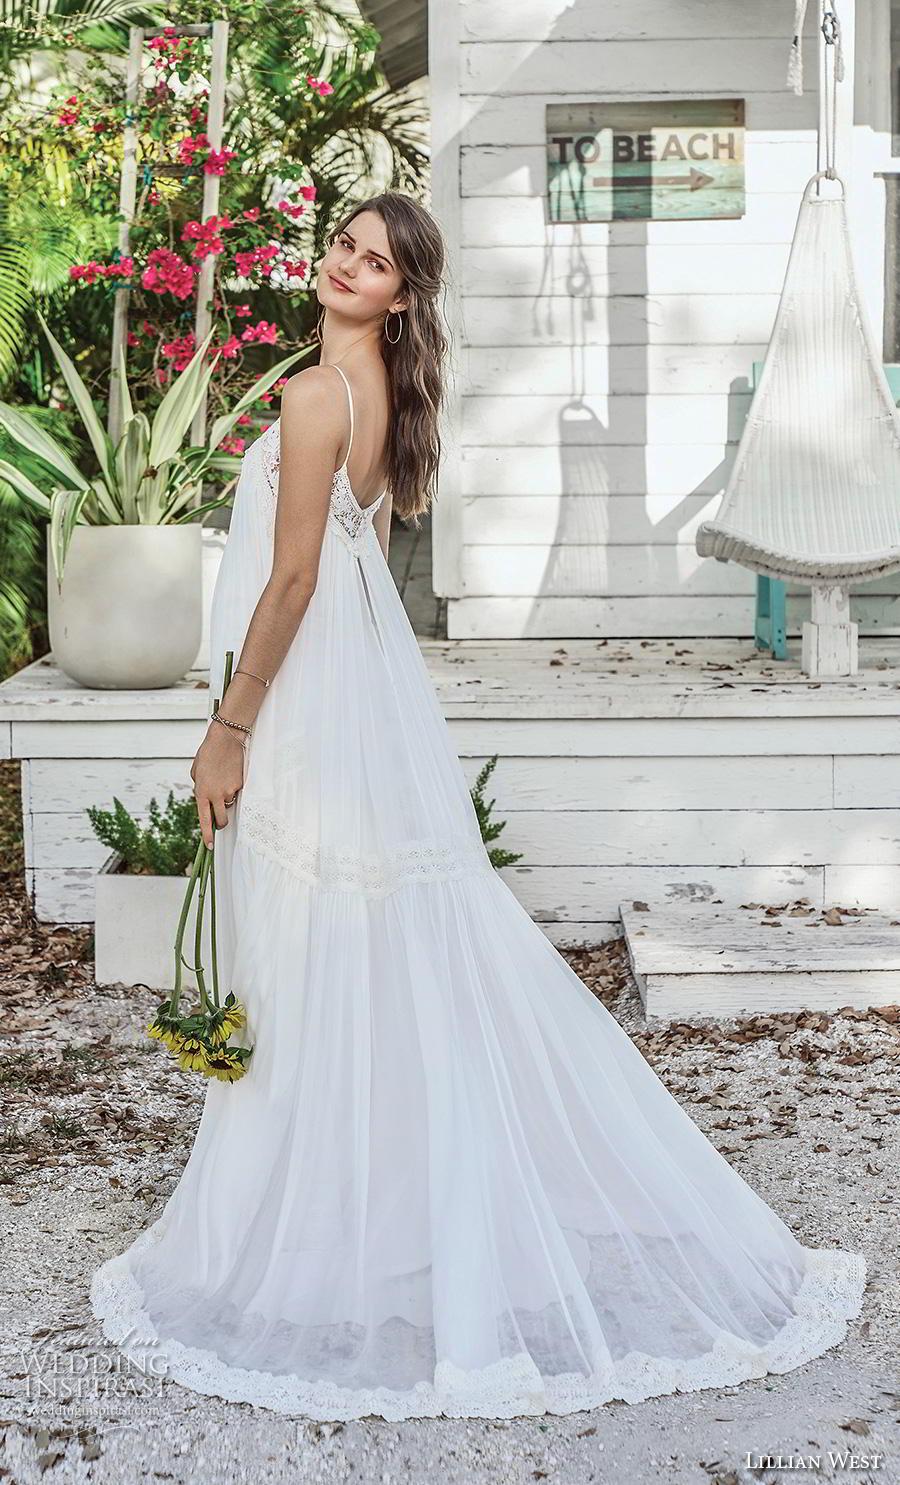 lillian west spring 2019 bridal spaghetti strap diamond neck simple bohemian trapeze tent wedding dress open v back chapel train (13) bv